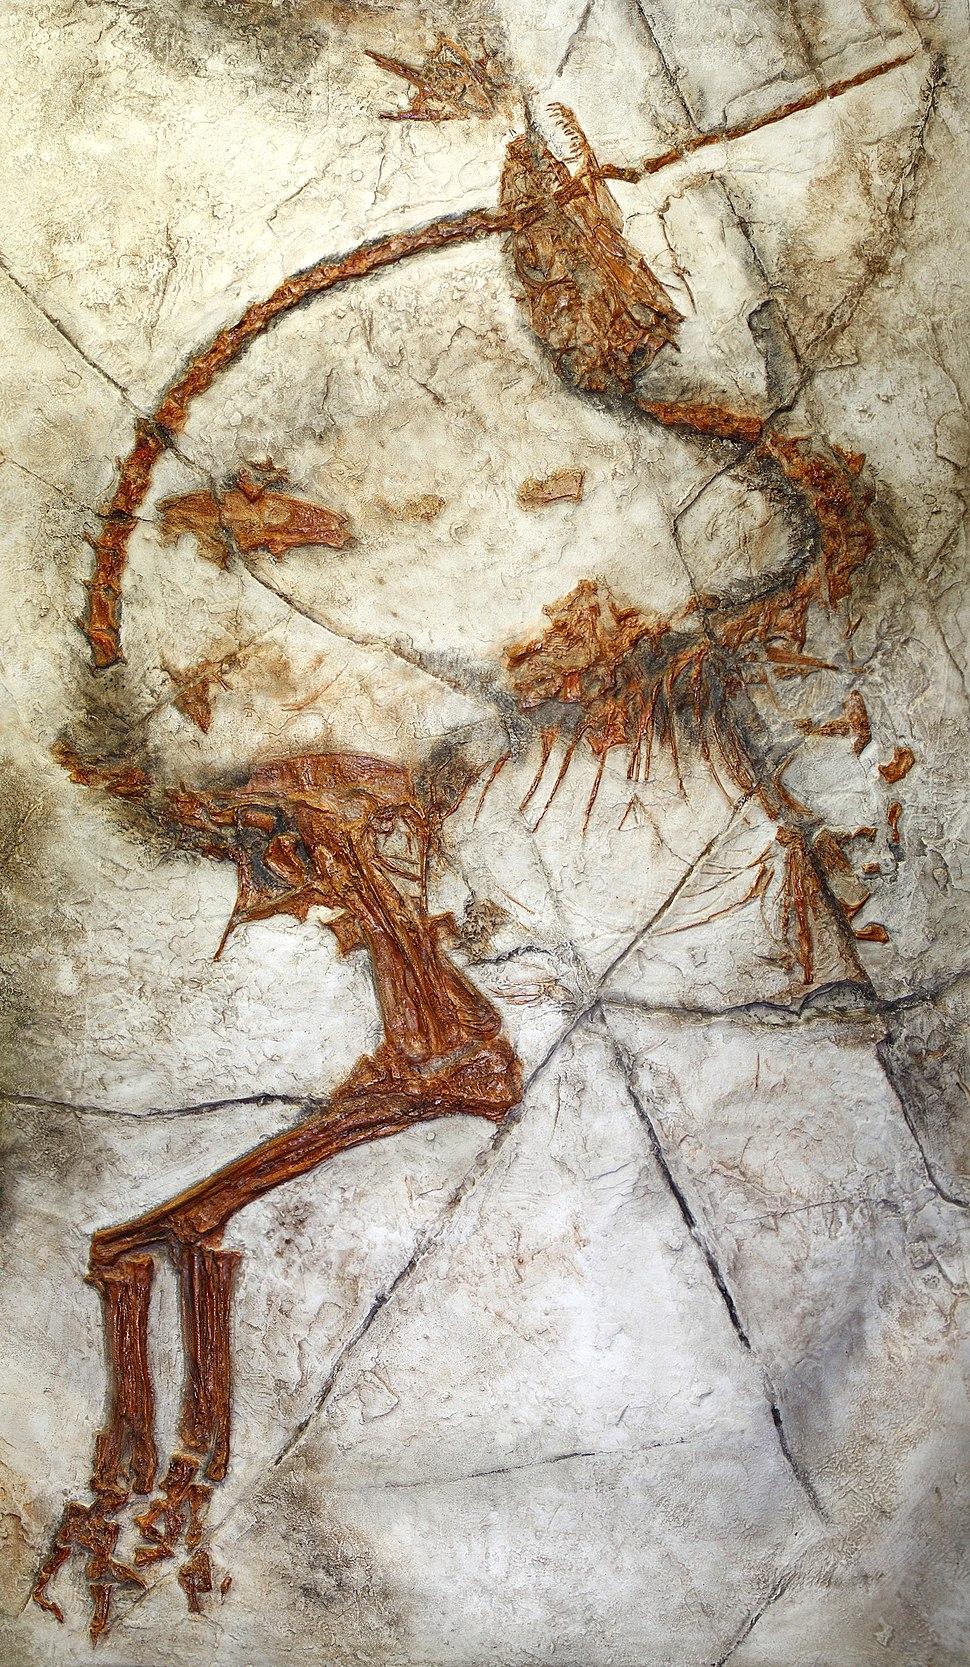 Sinosauropteryx GMV 2124